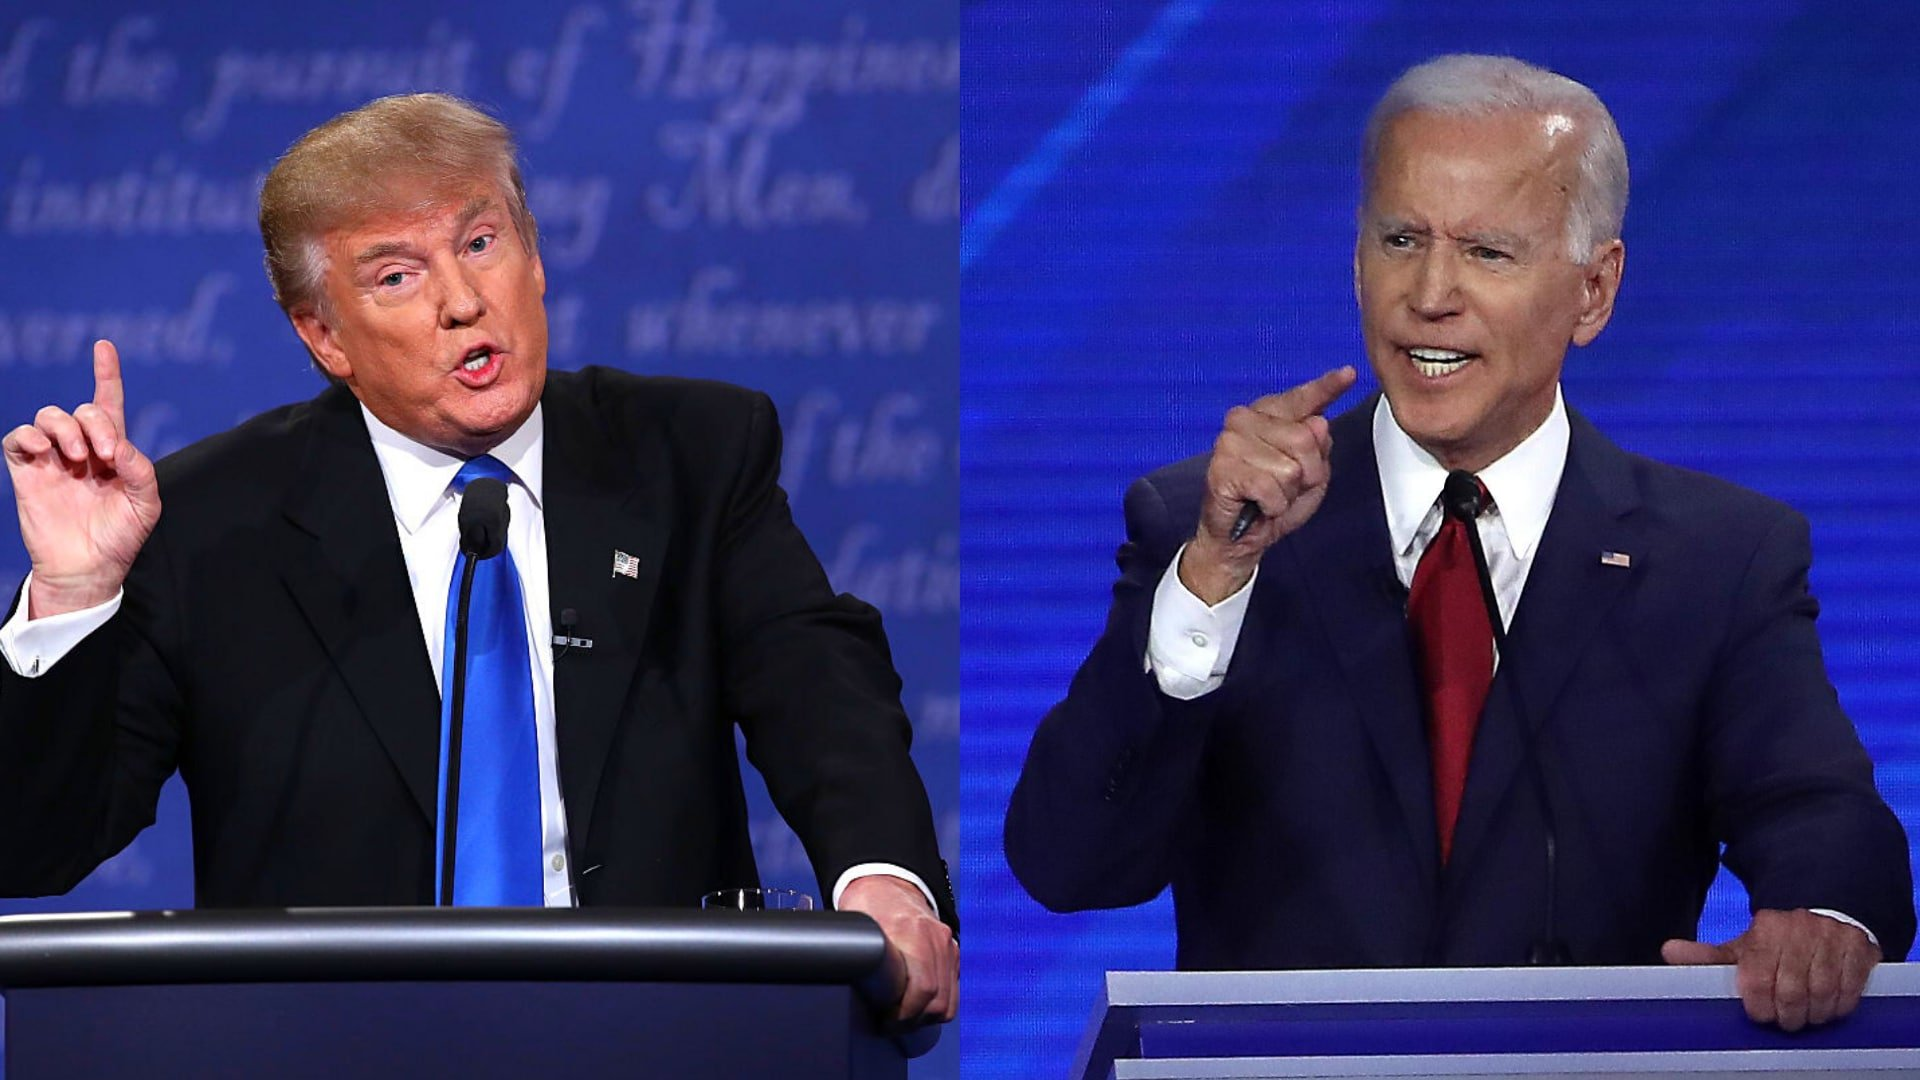 Trump and Biden trade barbs over coronavirus response, masks